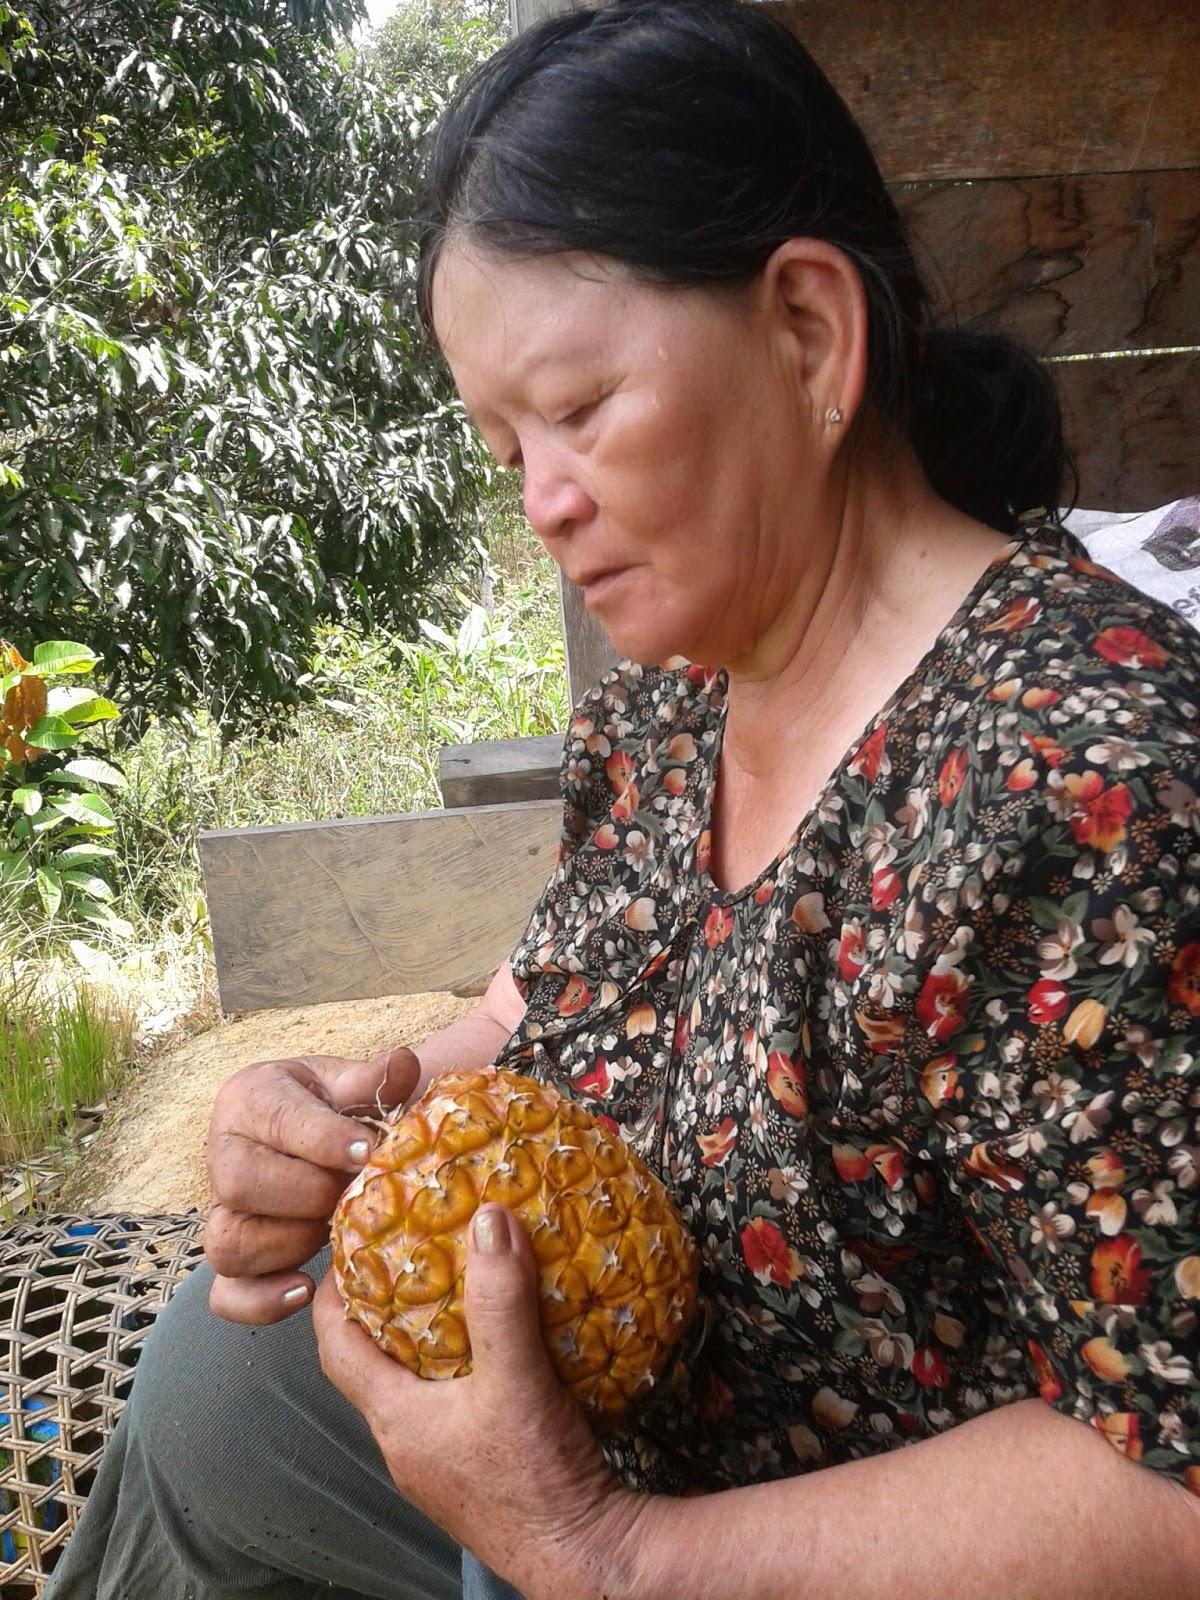 The Bario Pineapple